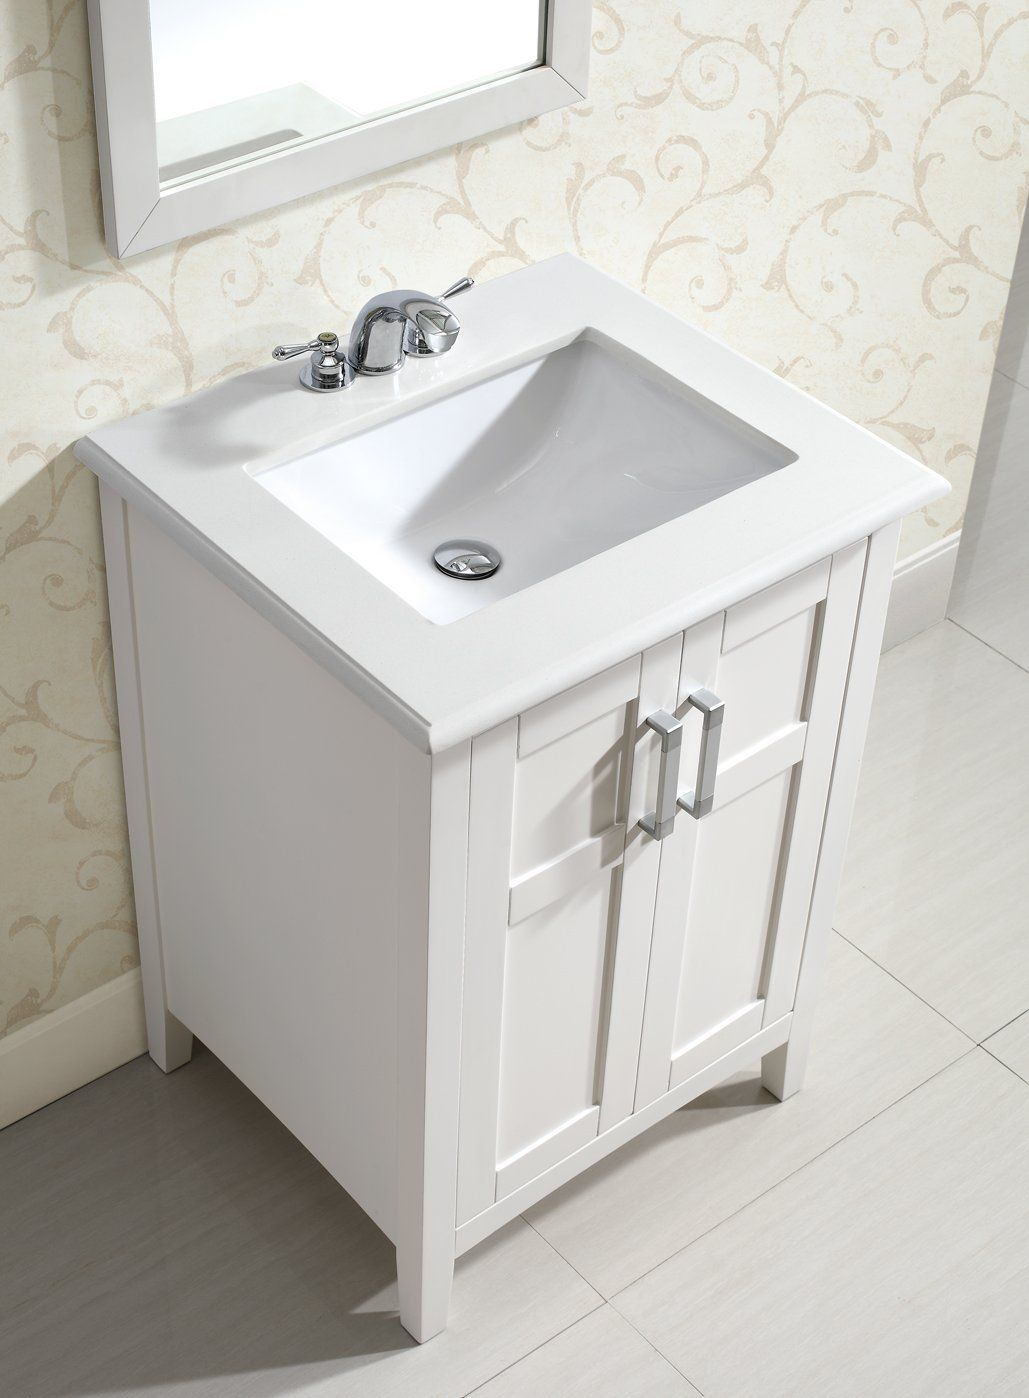 24 W X 35 H Simpli Home Winston 24 Bath Vanity White Vanity Sinks Amazon Com 24 Inch Bathroom Vanity Marble Vanity Tops Single Bathroom Vanity